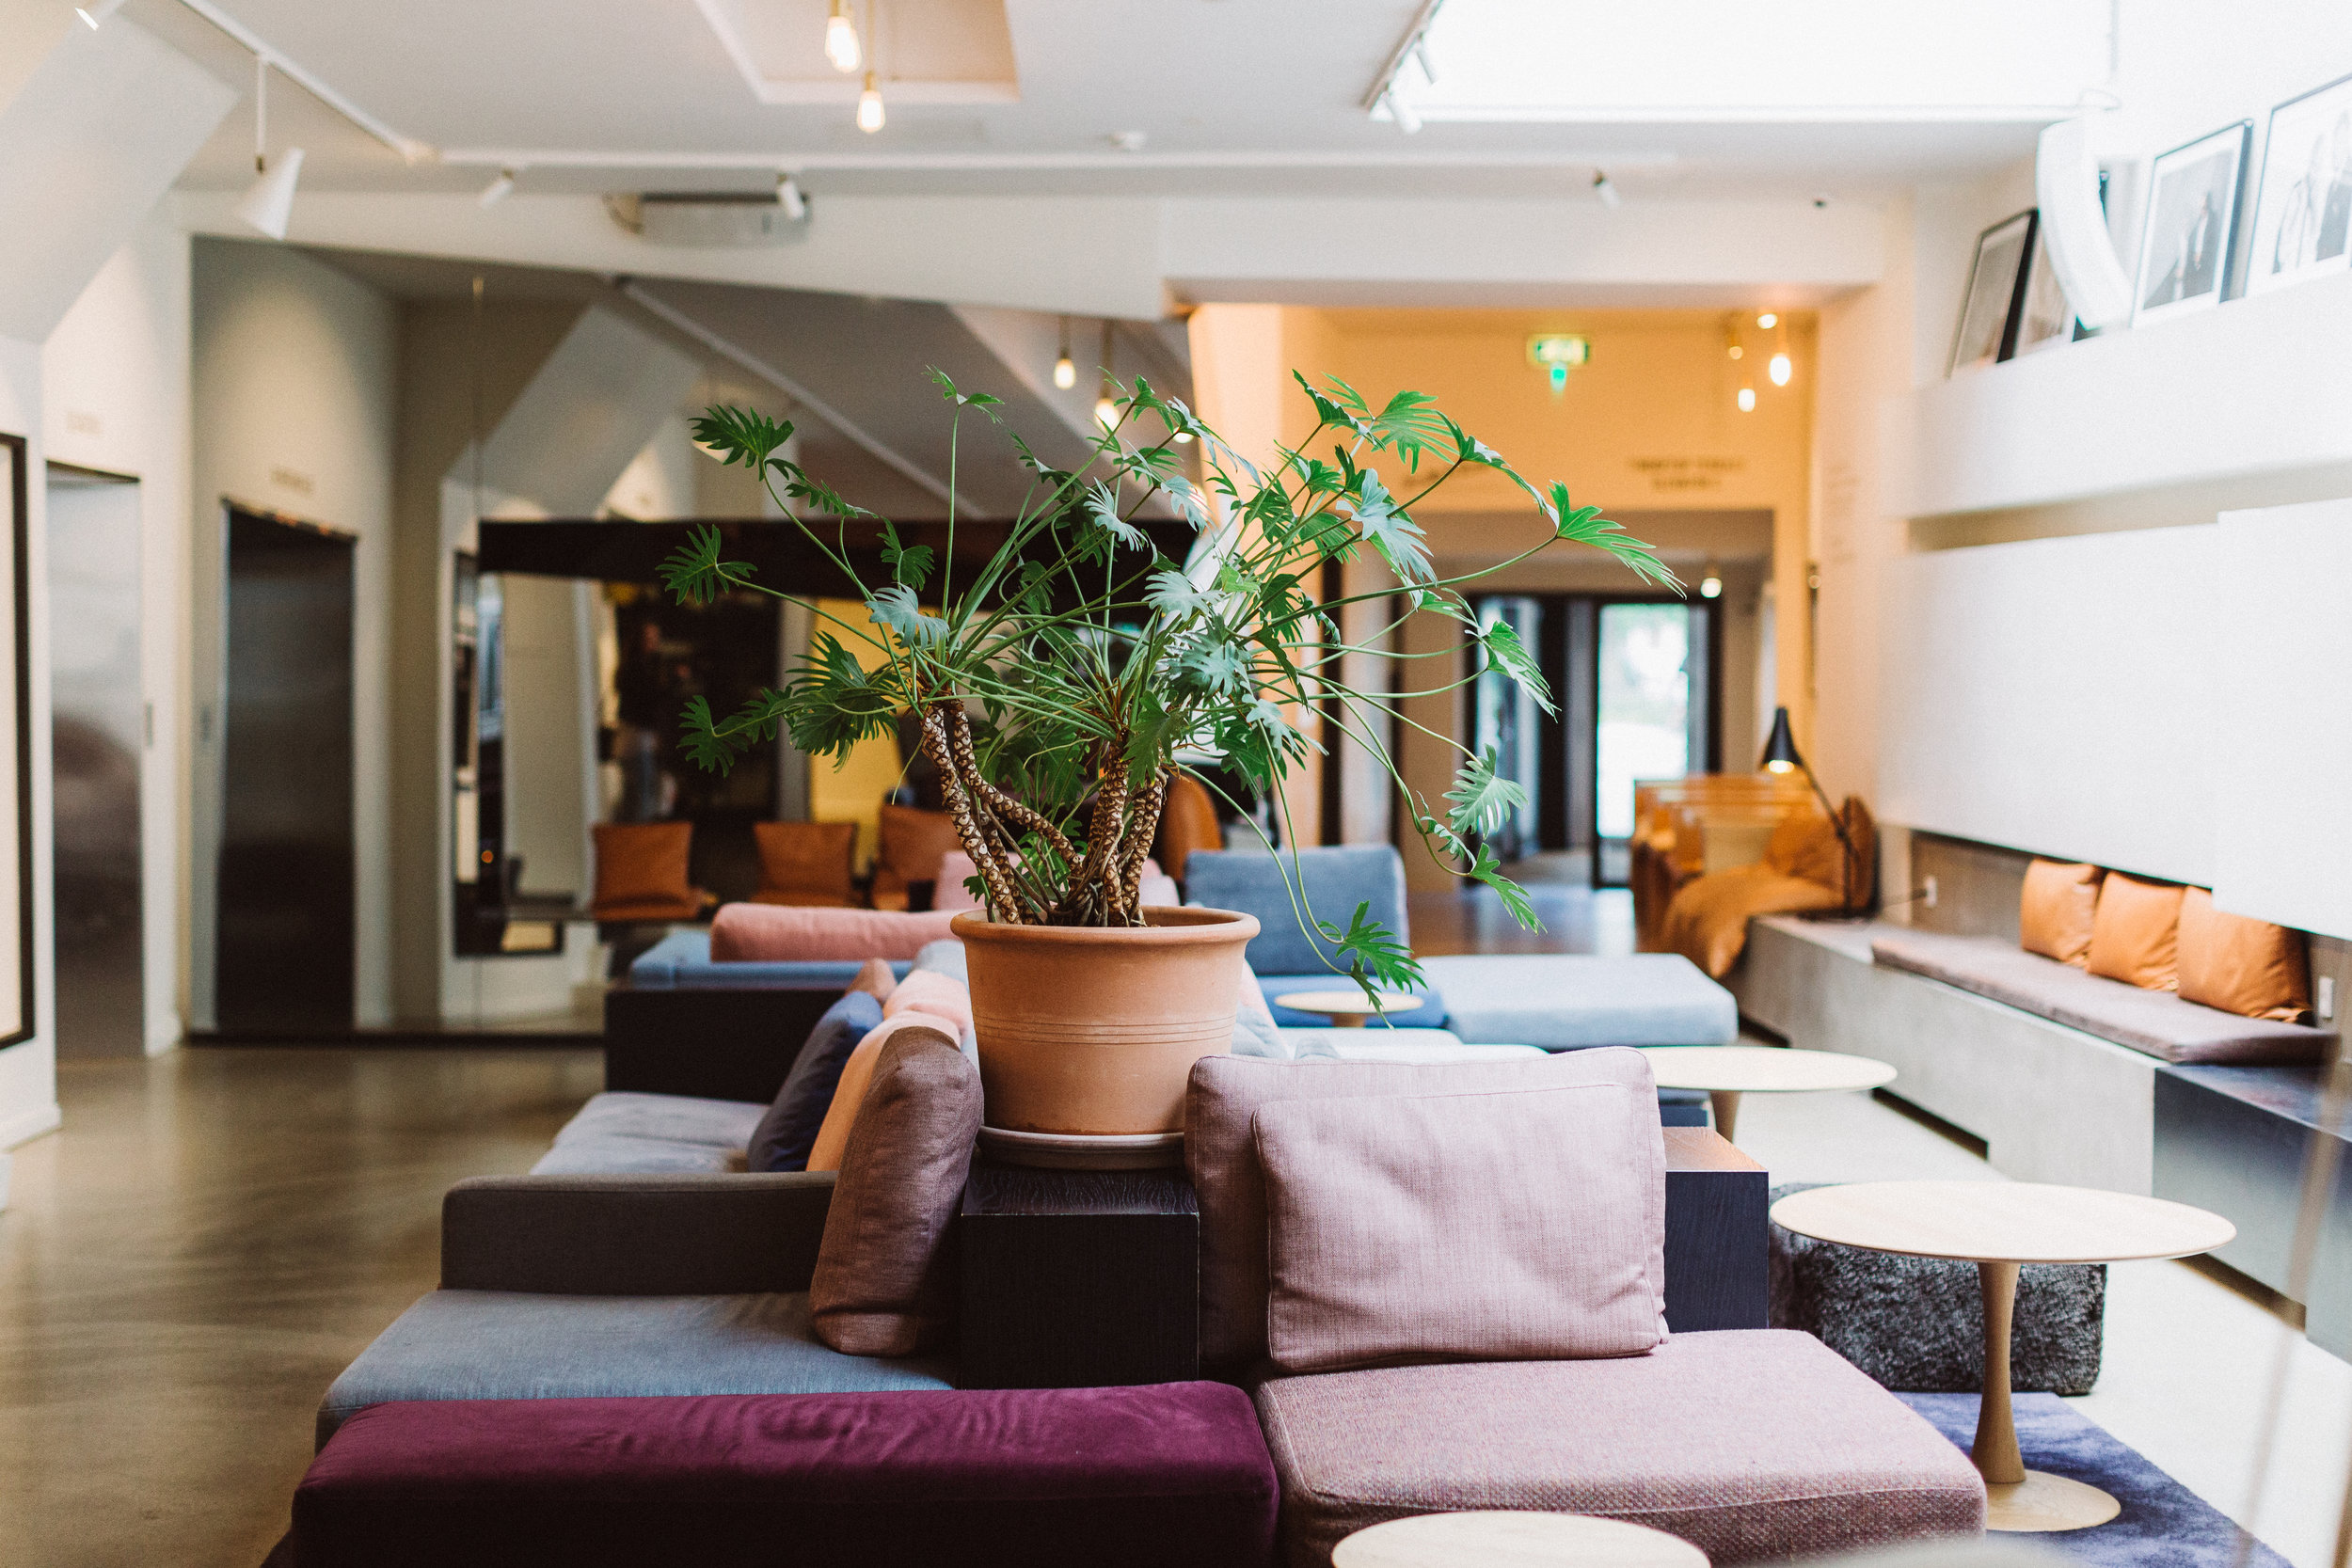 Hotel-SP34-Lobby-04-1.jpg